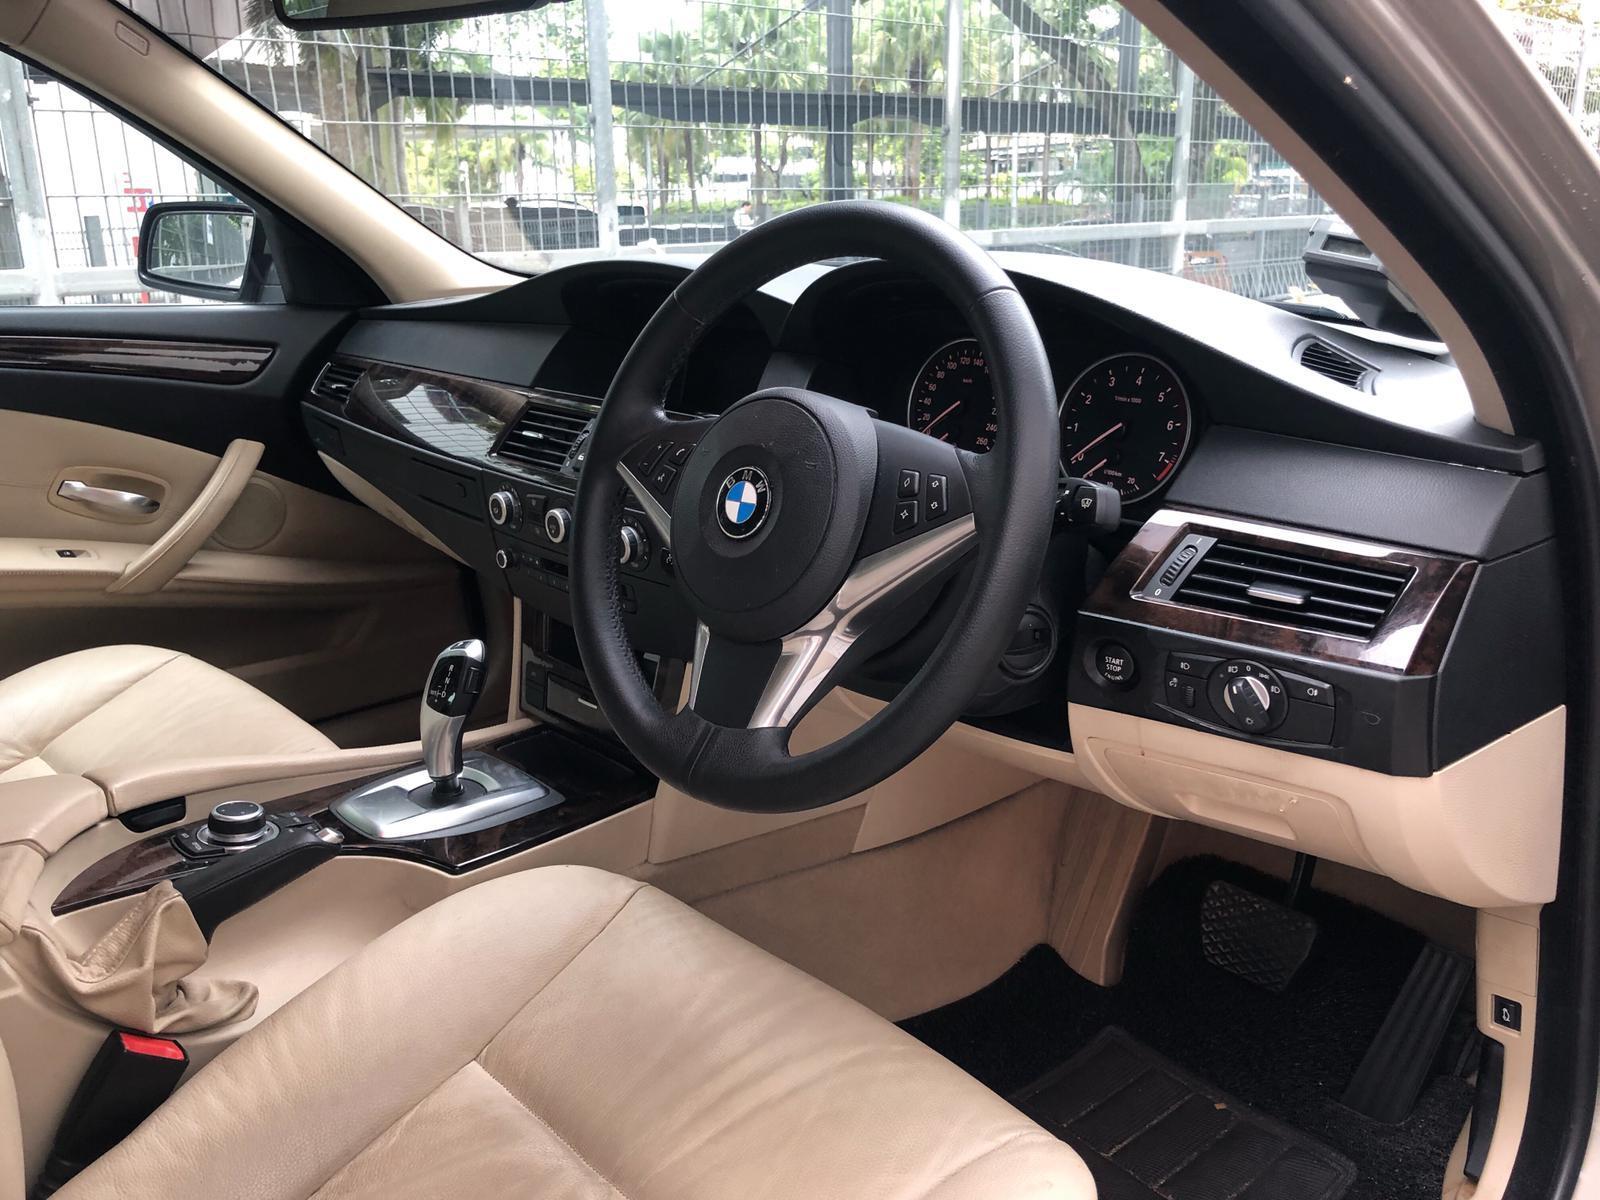 BMW 525i XL conti car rent personal use grab gojek long term.cheap rental(min 2mth)